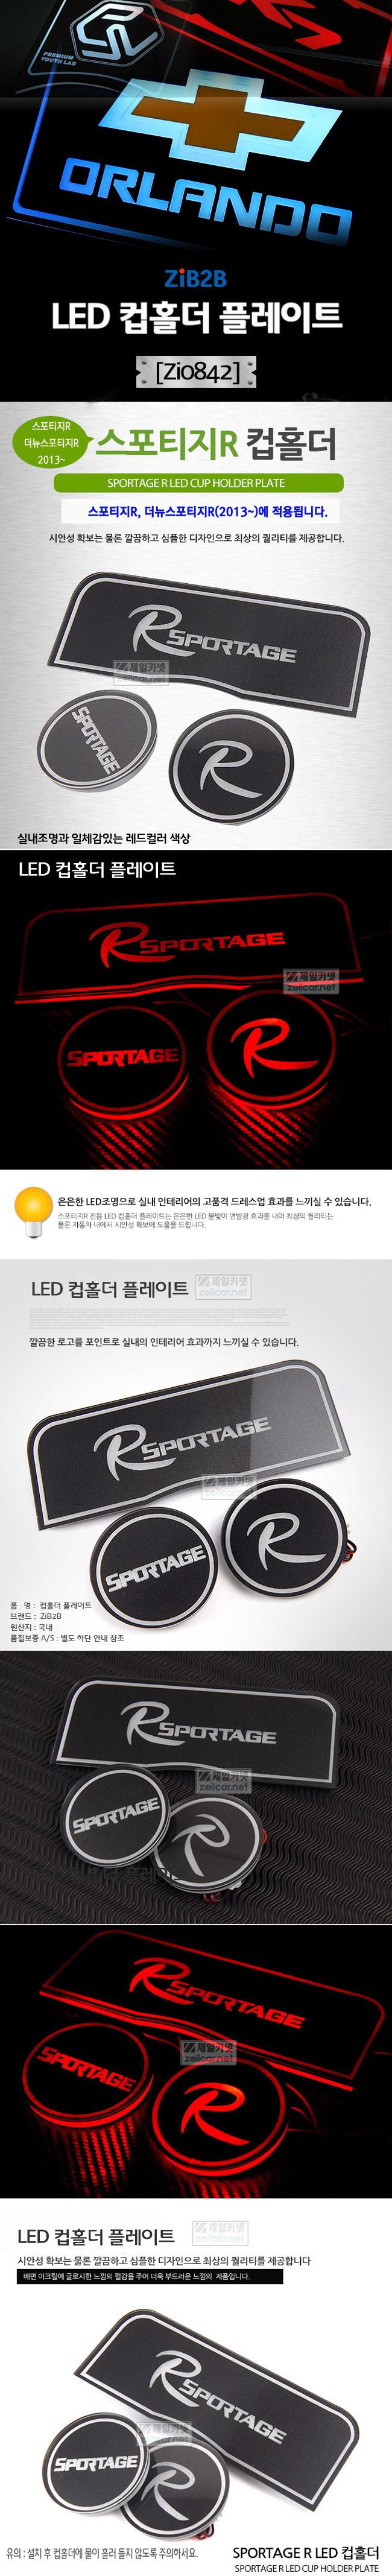 [ZiB2B] 더뉴스포티지R (2013년형) 전용 LED 컵홀더 콘솔플레이트 [Zi0842]